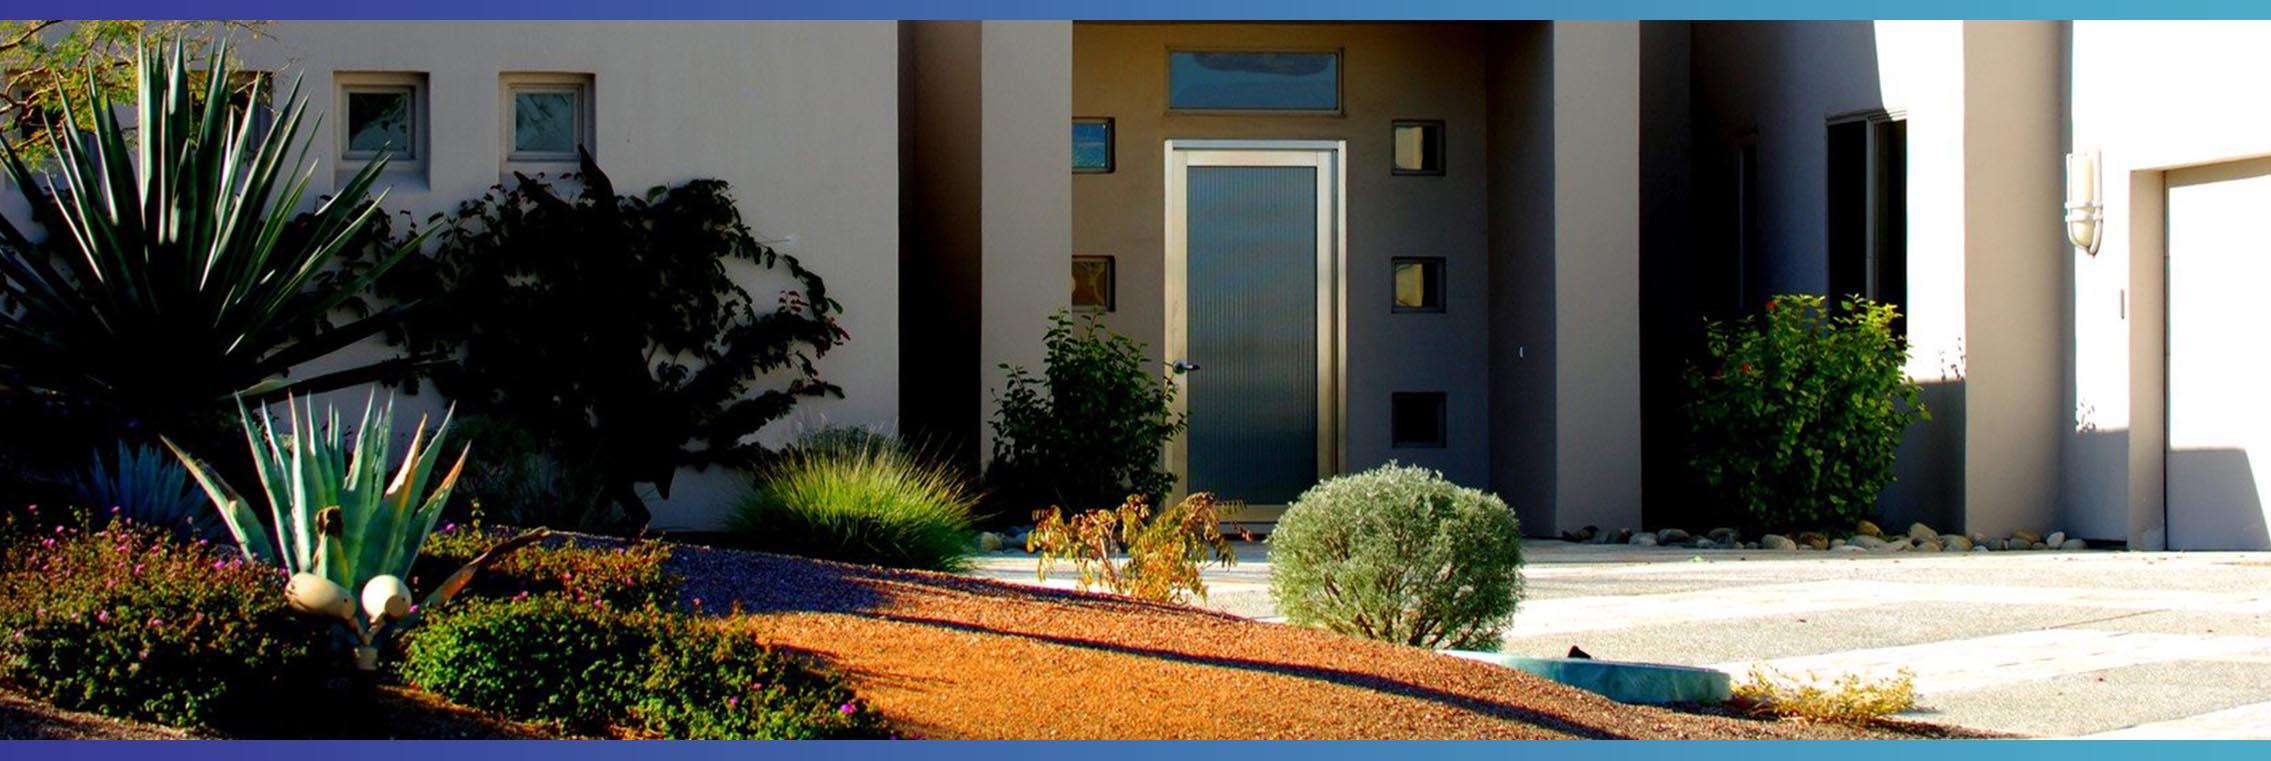 Header image - front entry doors